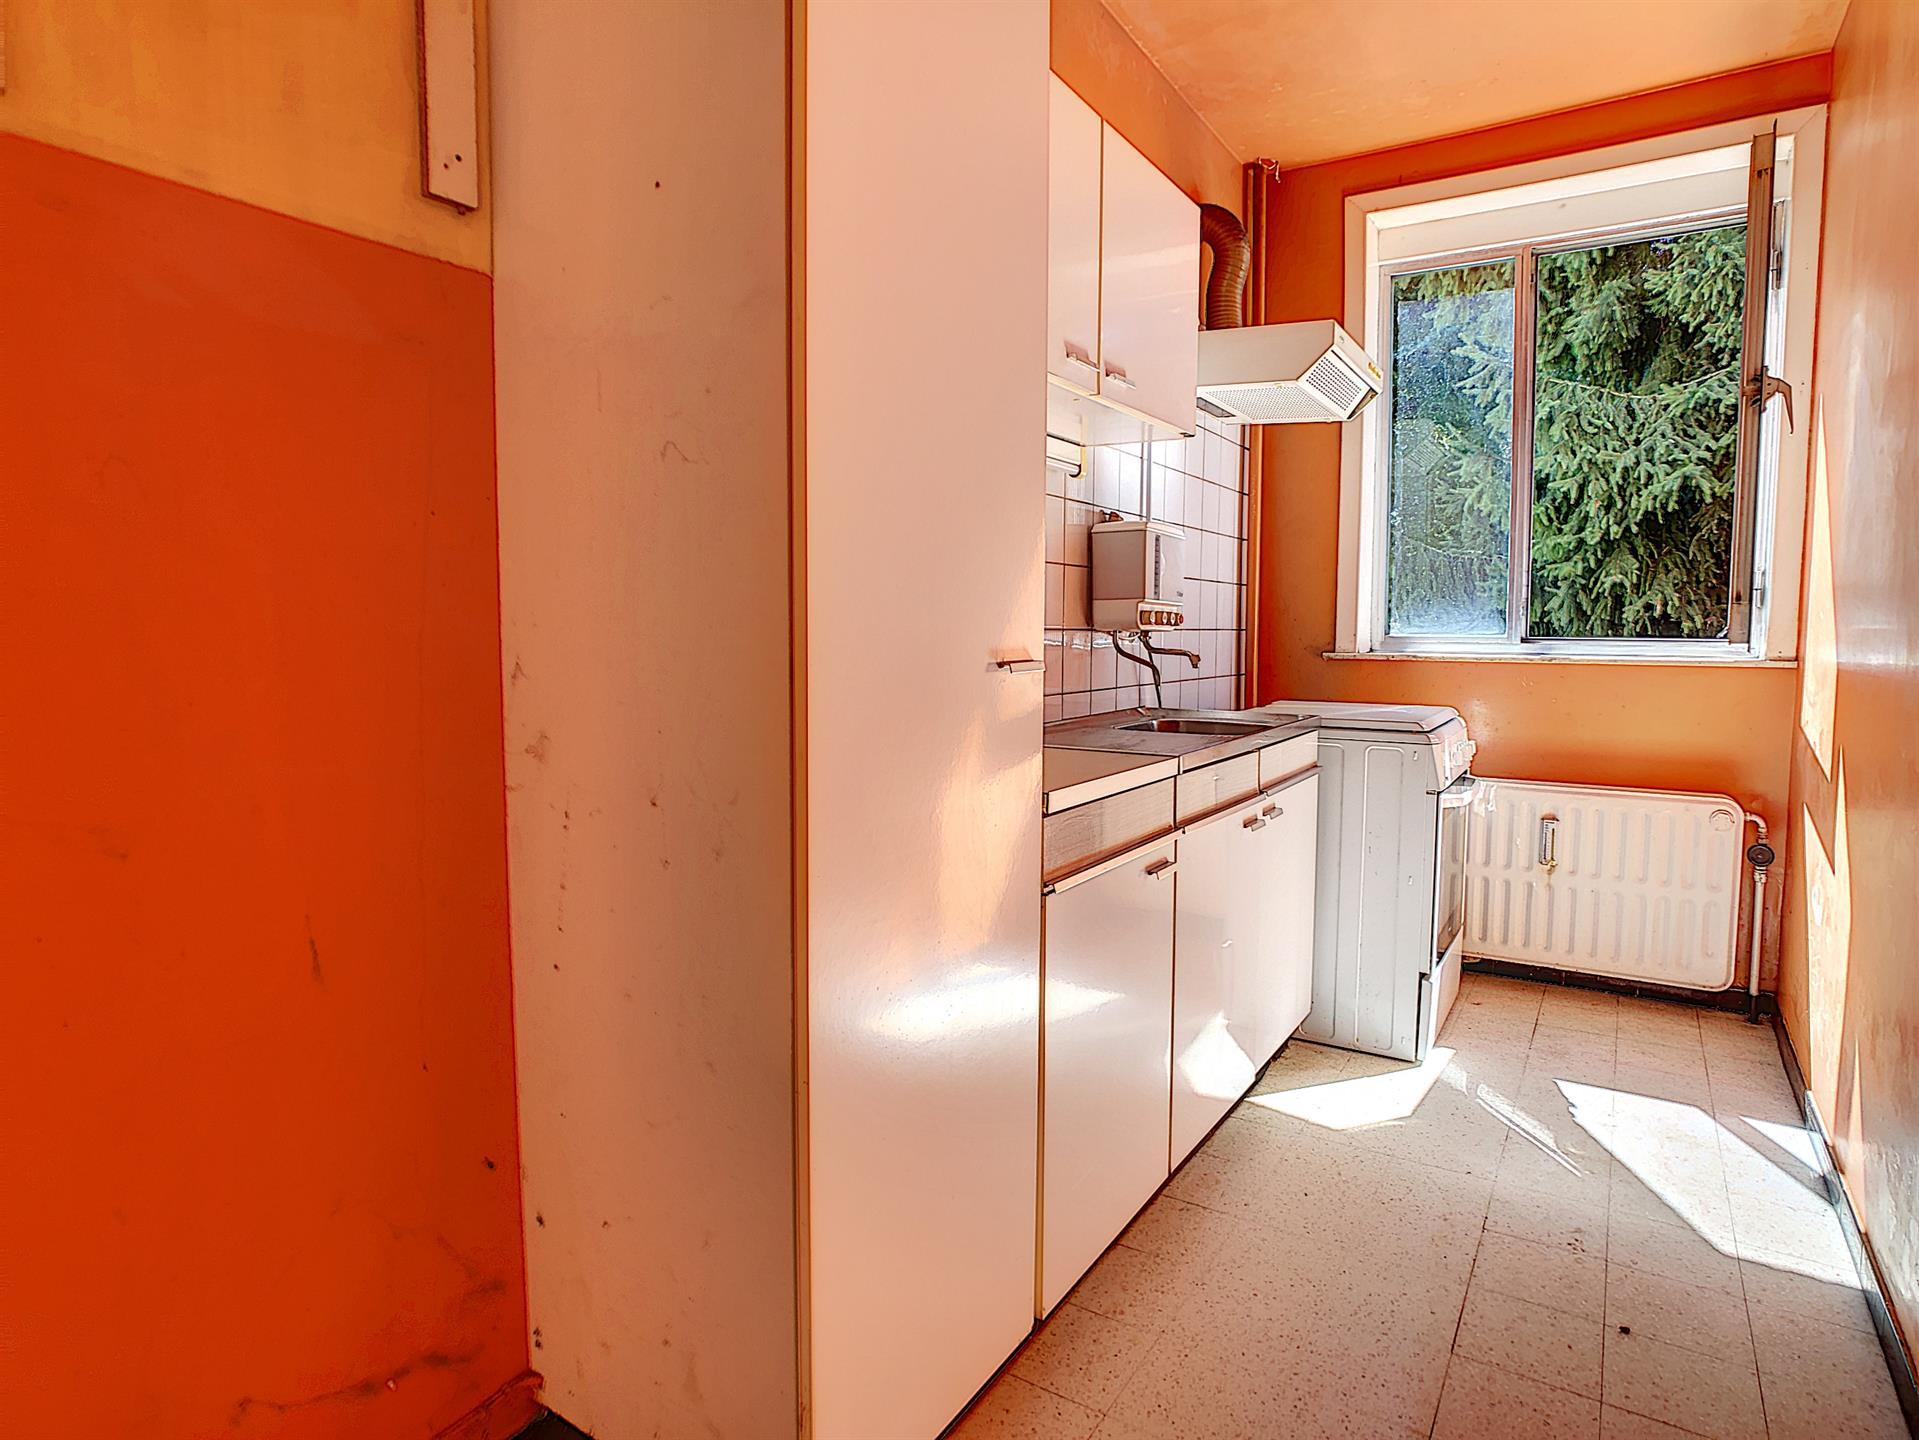 Appartement - Anderlecht - #4169802-2